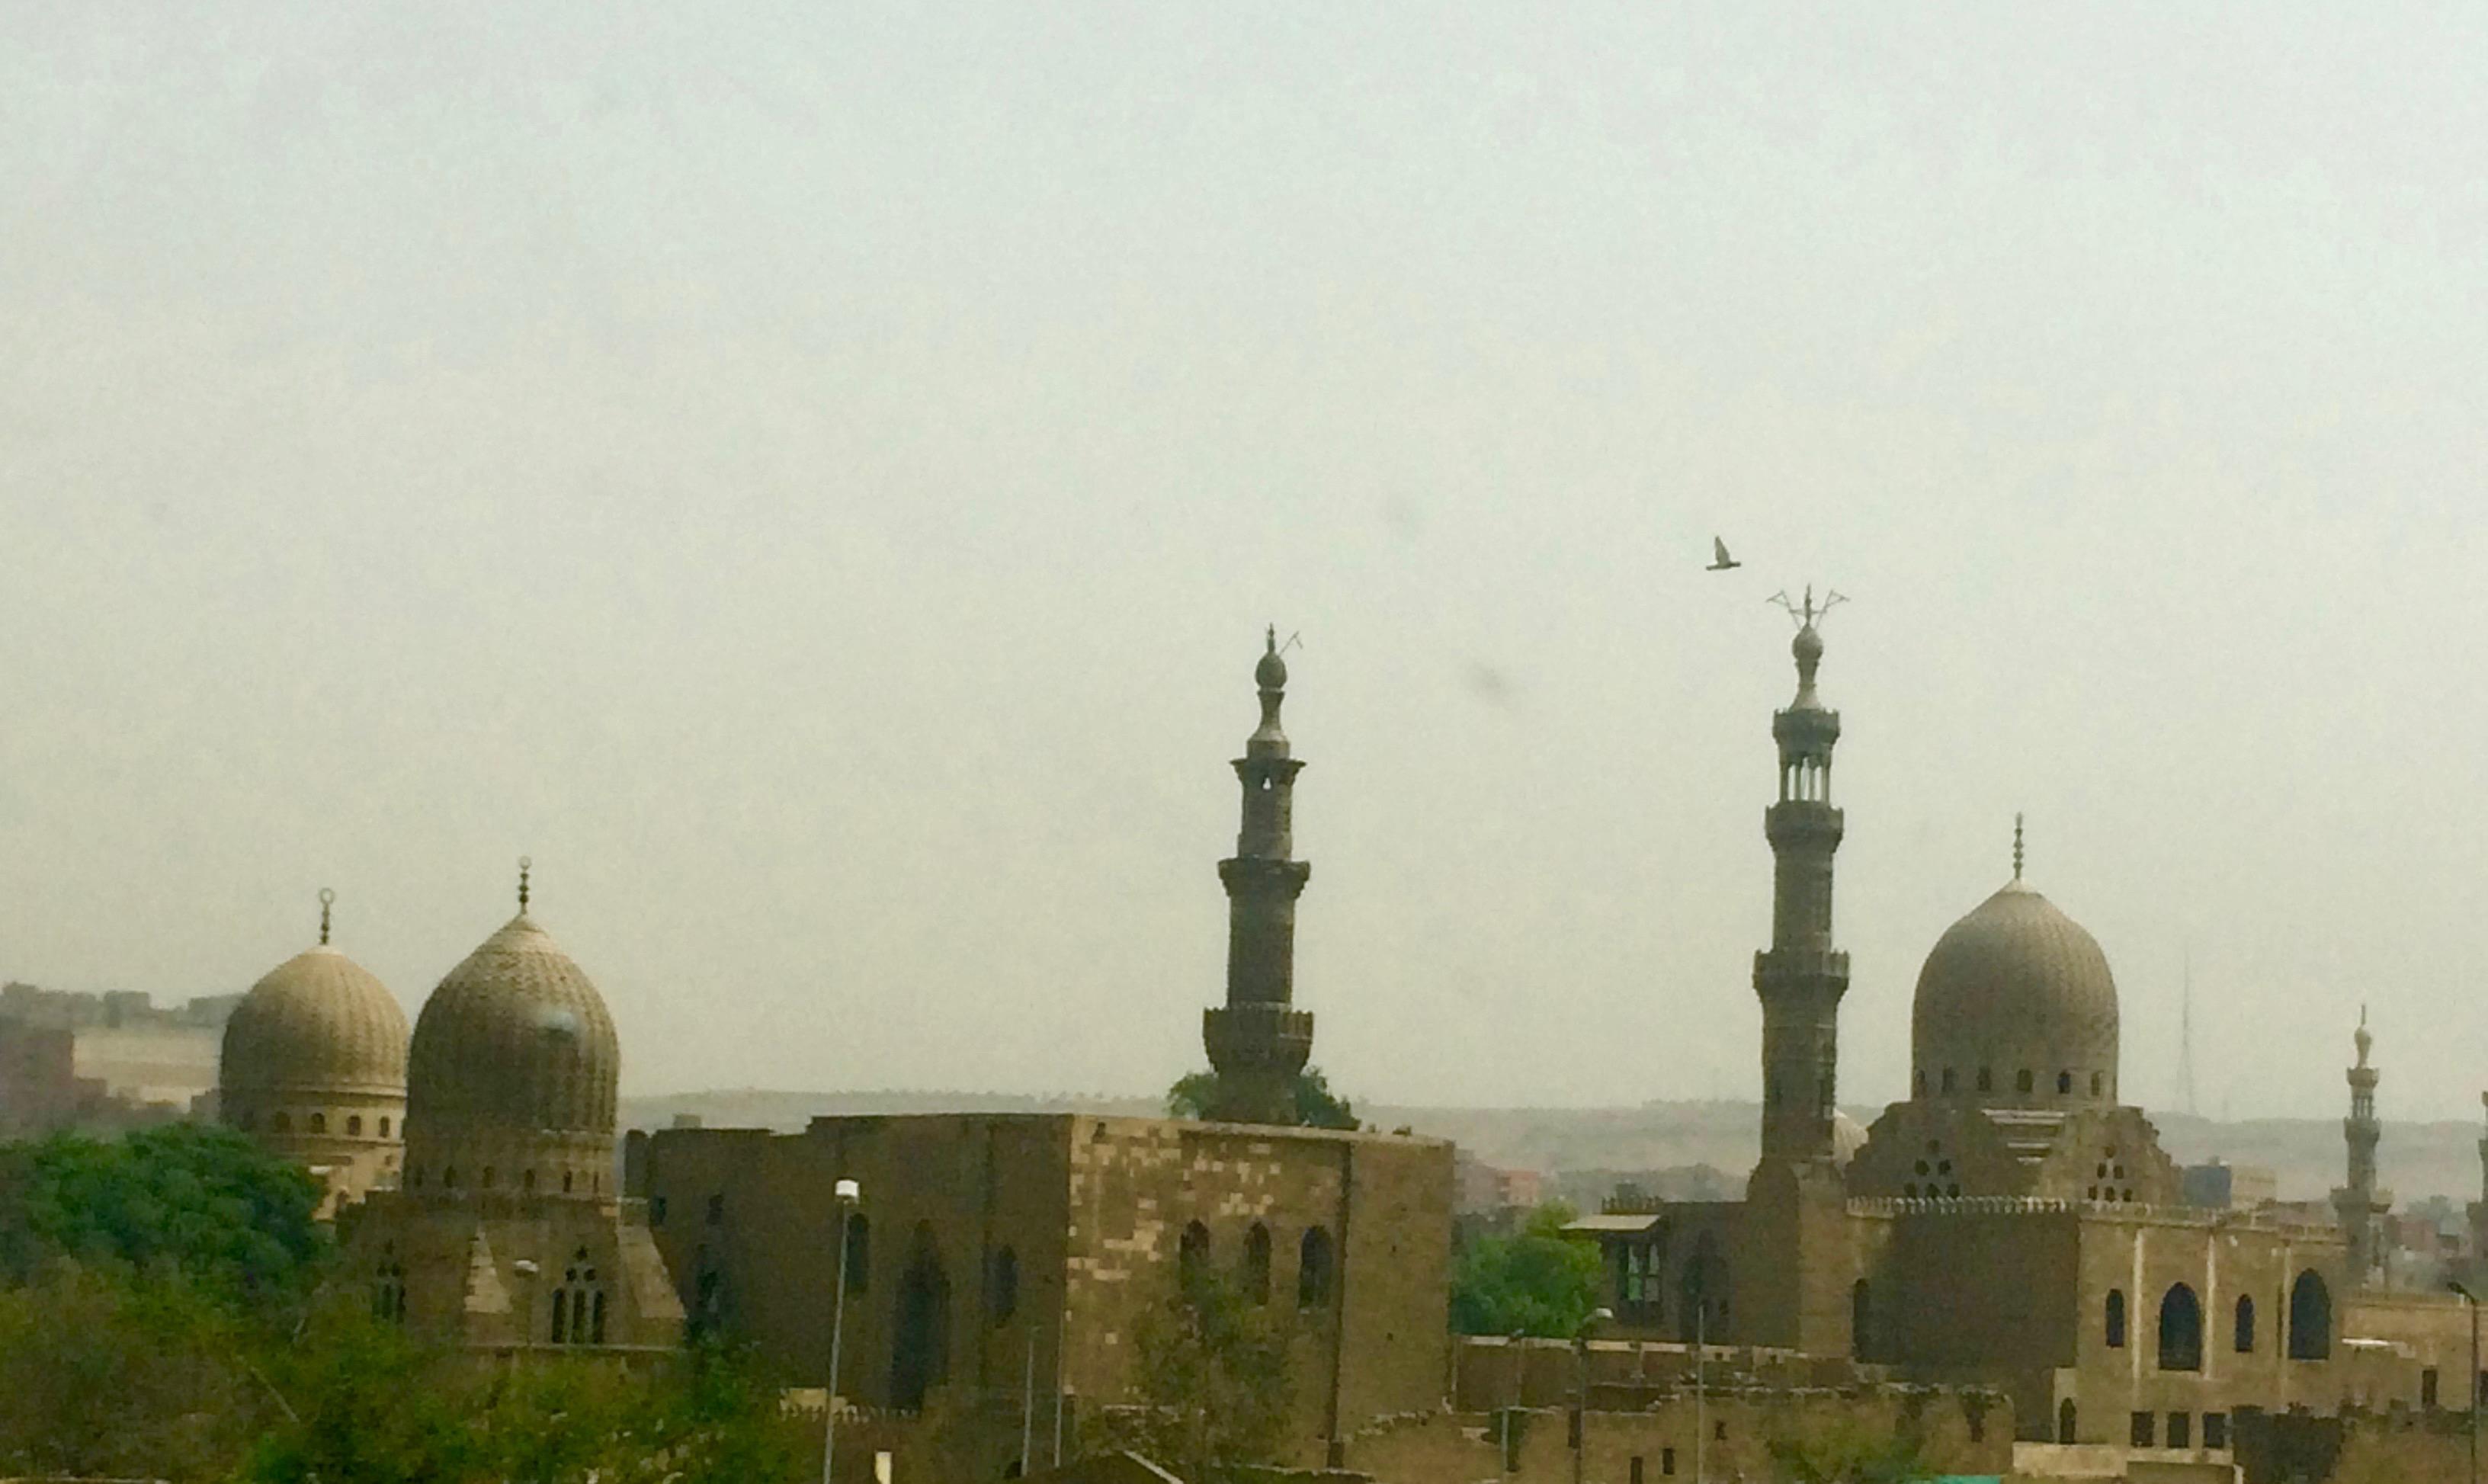 Egypt: © Photo: Hakim Khatib/MPC Journal